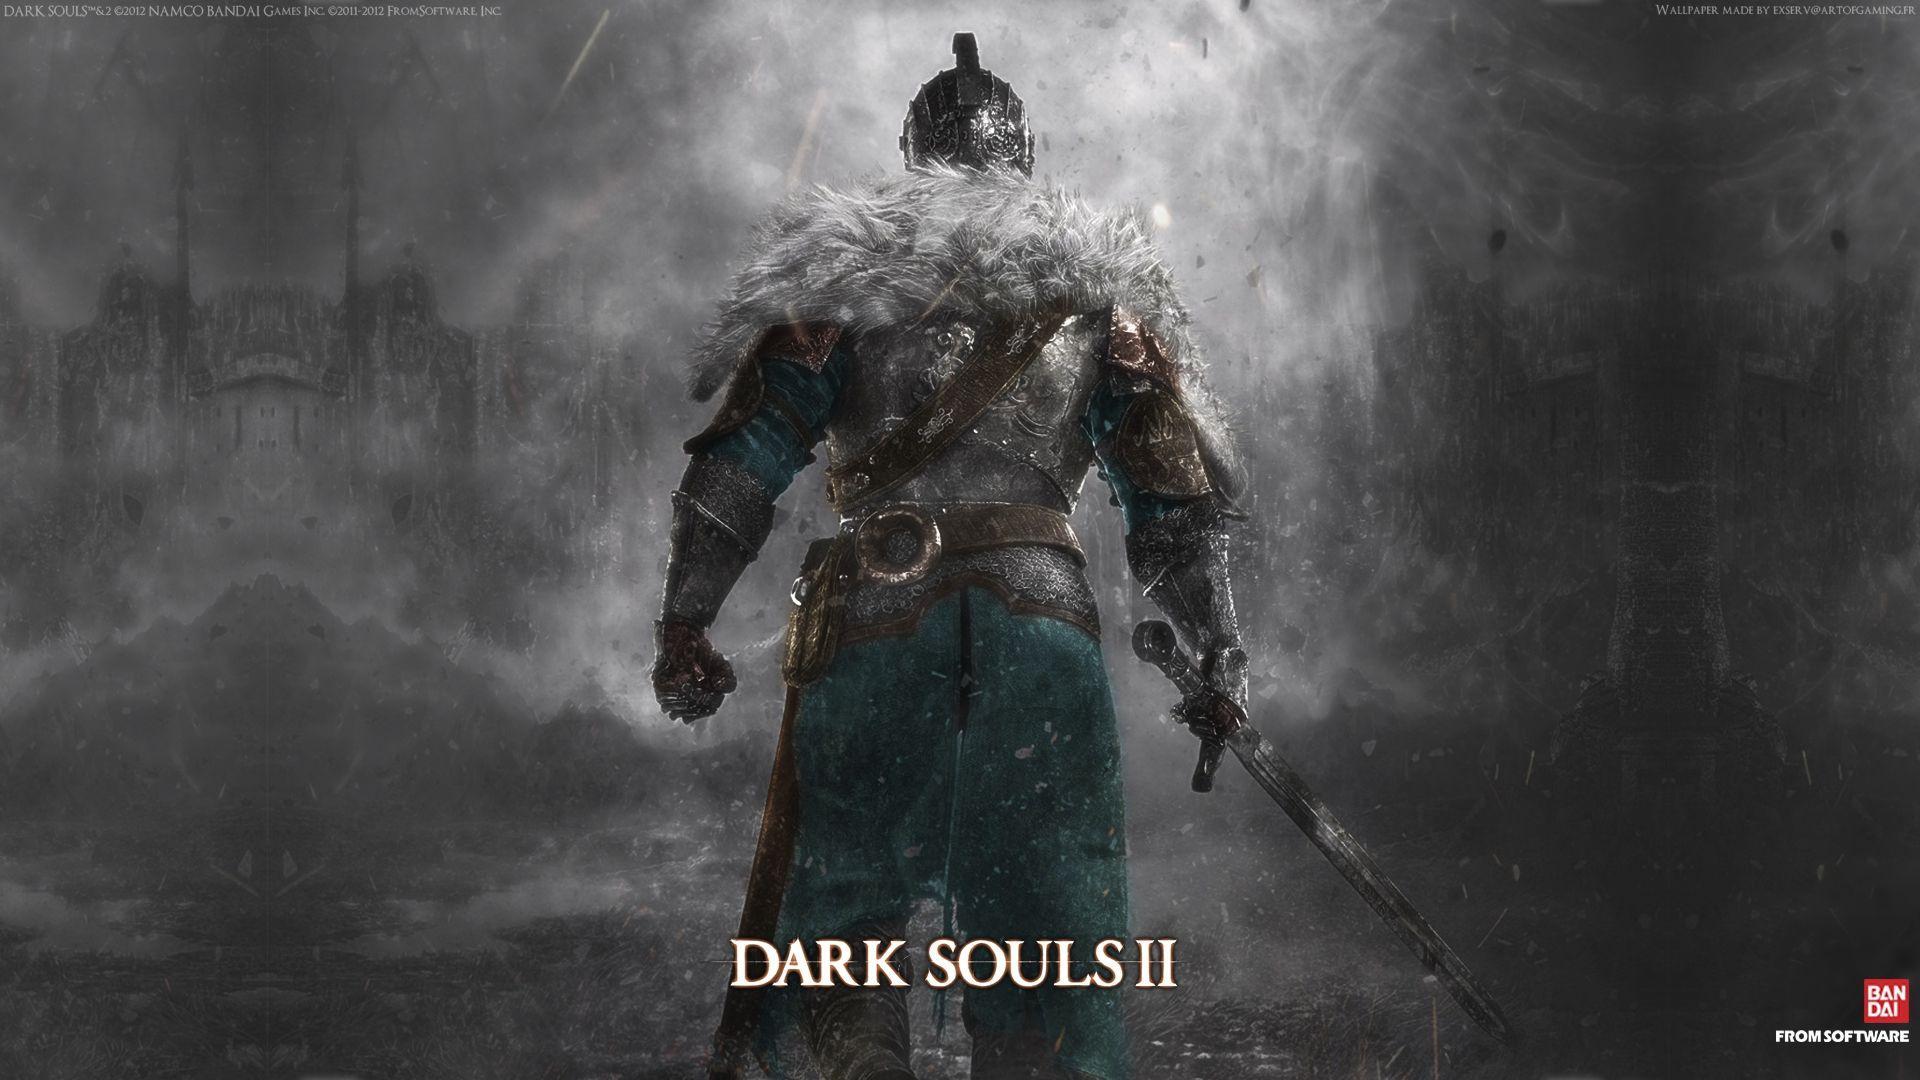 Dark Souls 2 Phone Wallpapers - Top Free Dark Souls 2 Phone Backgrounds -  WallpaperAccess